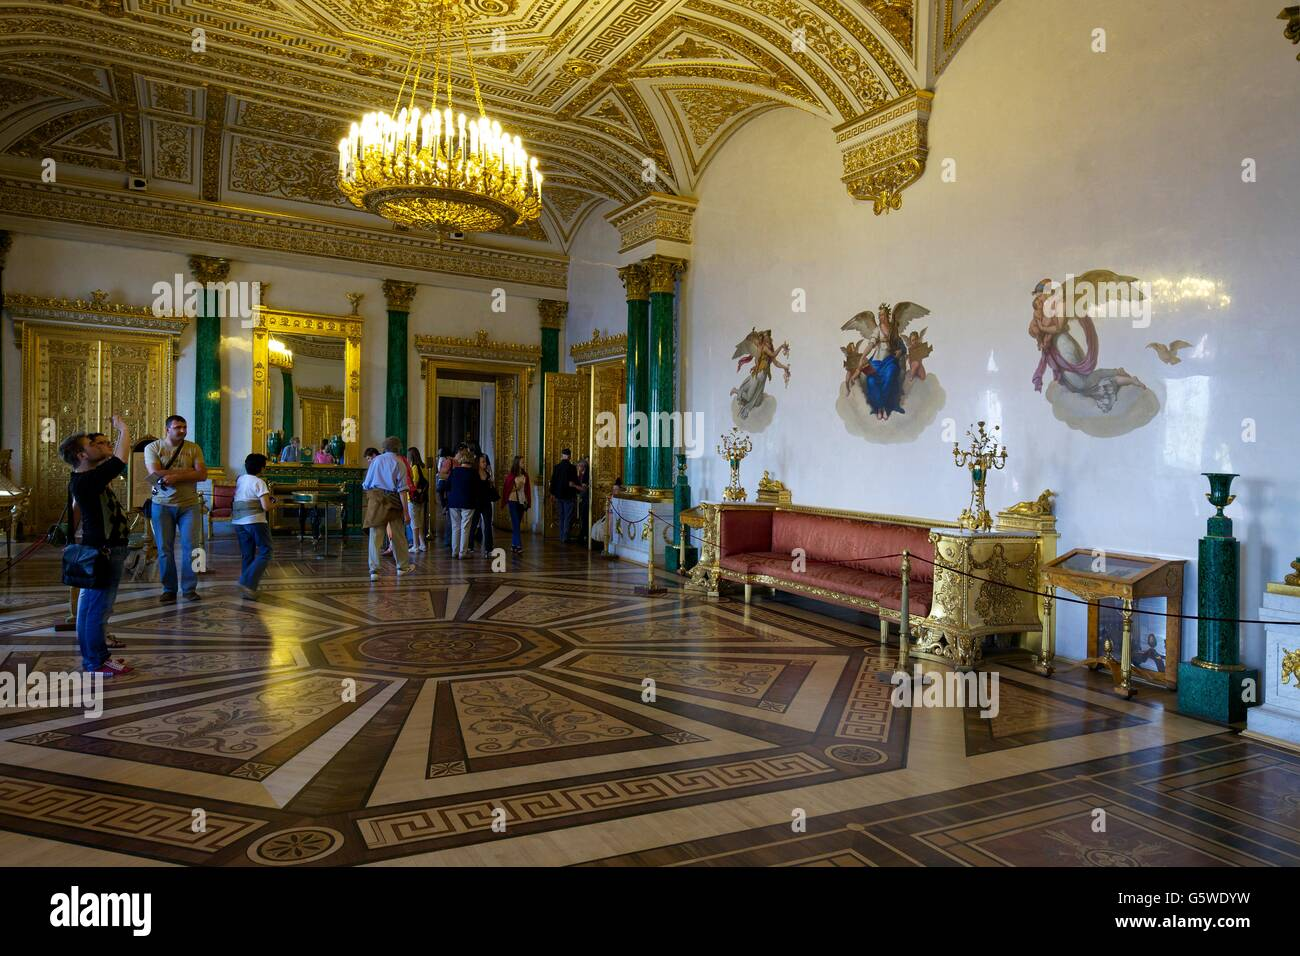 Jade Room, Winter Palace, Hermitage State Museum, Saint Petersburg, Russia - Stock Image